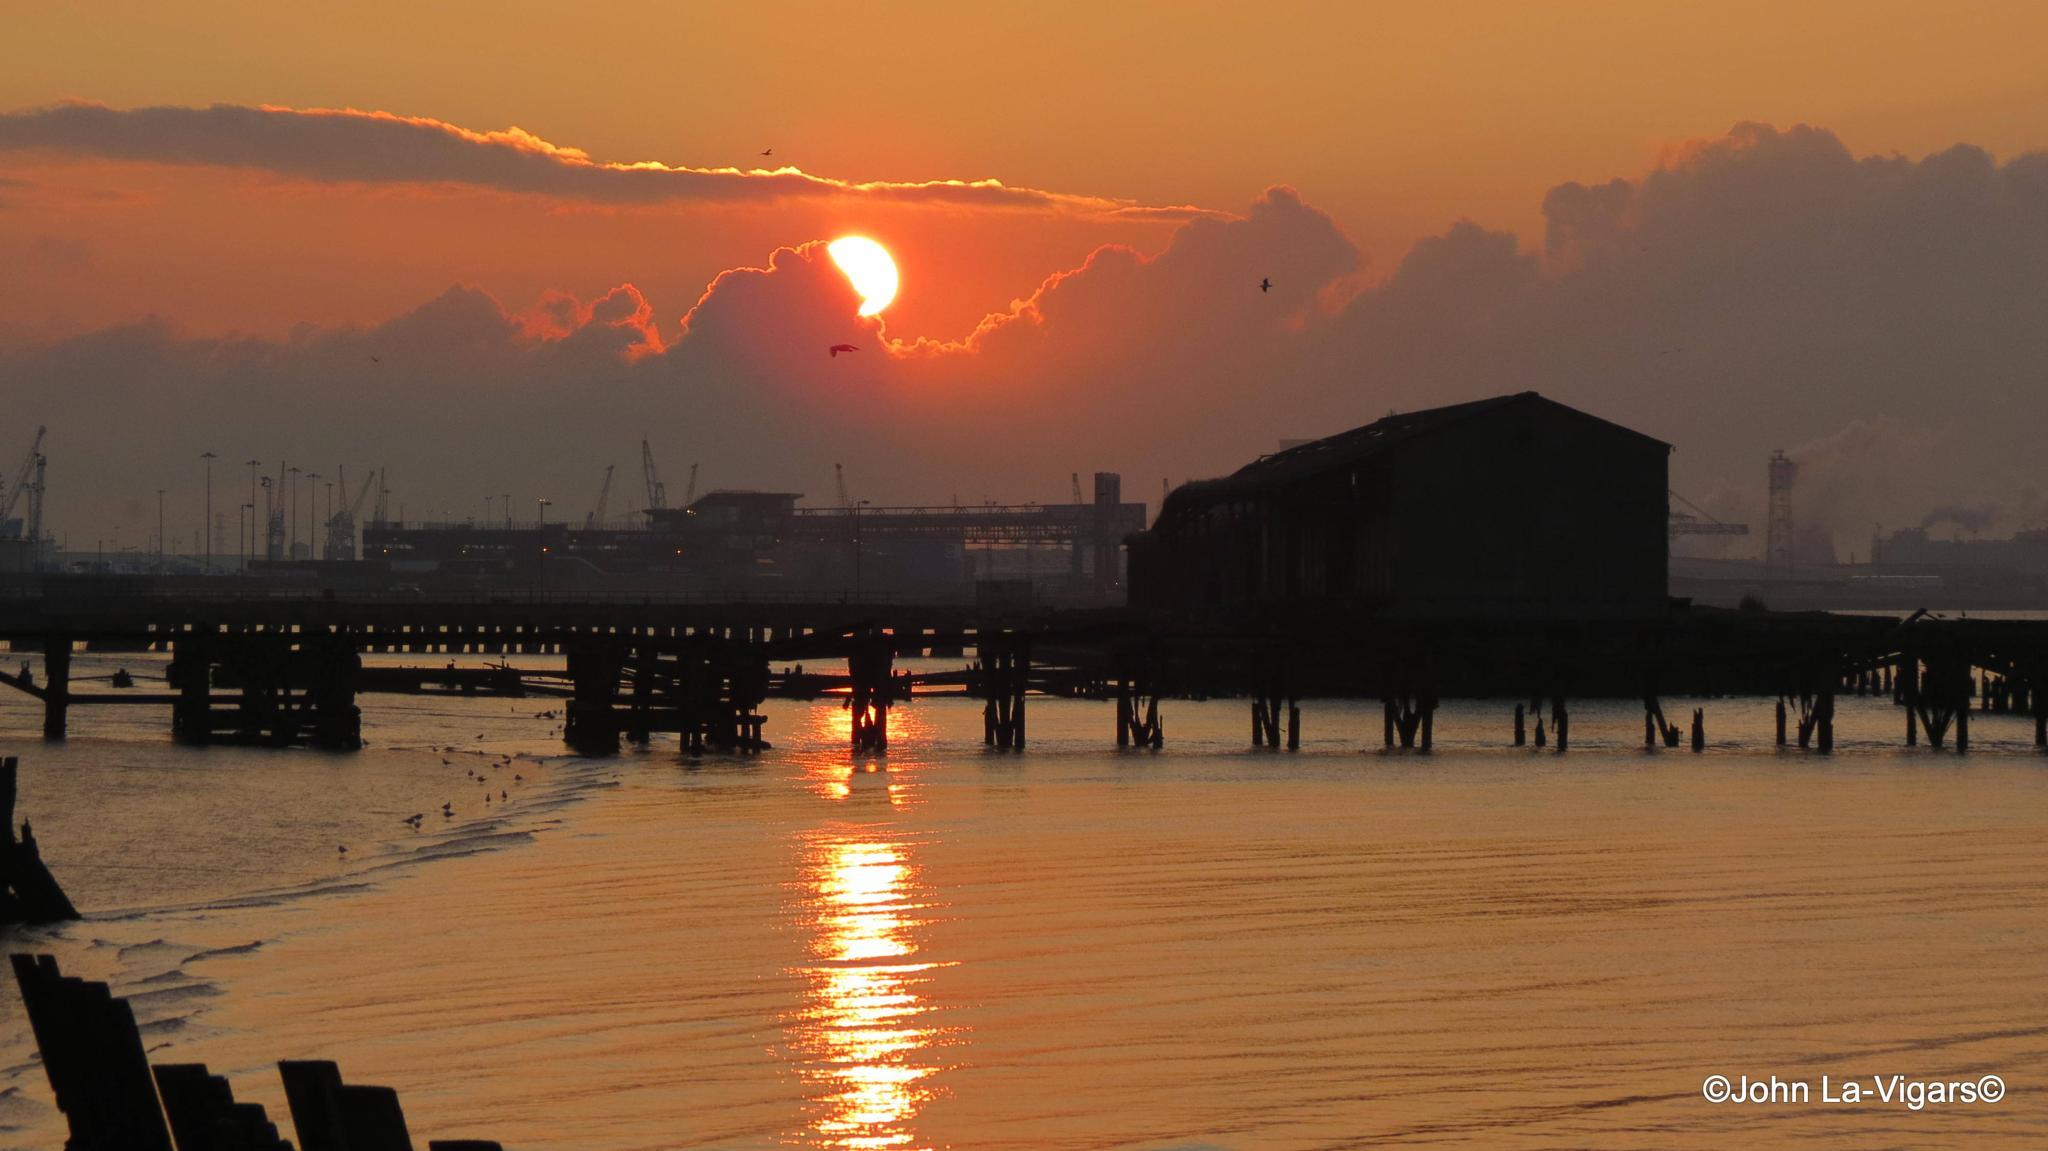 Sunrise by JohnLaVigars